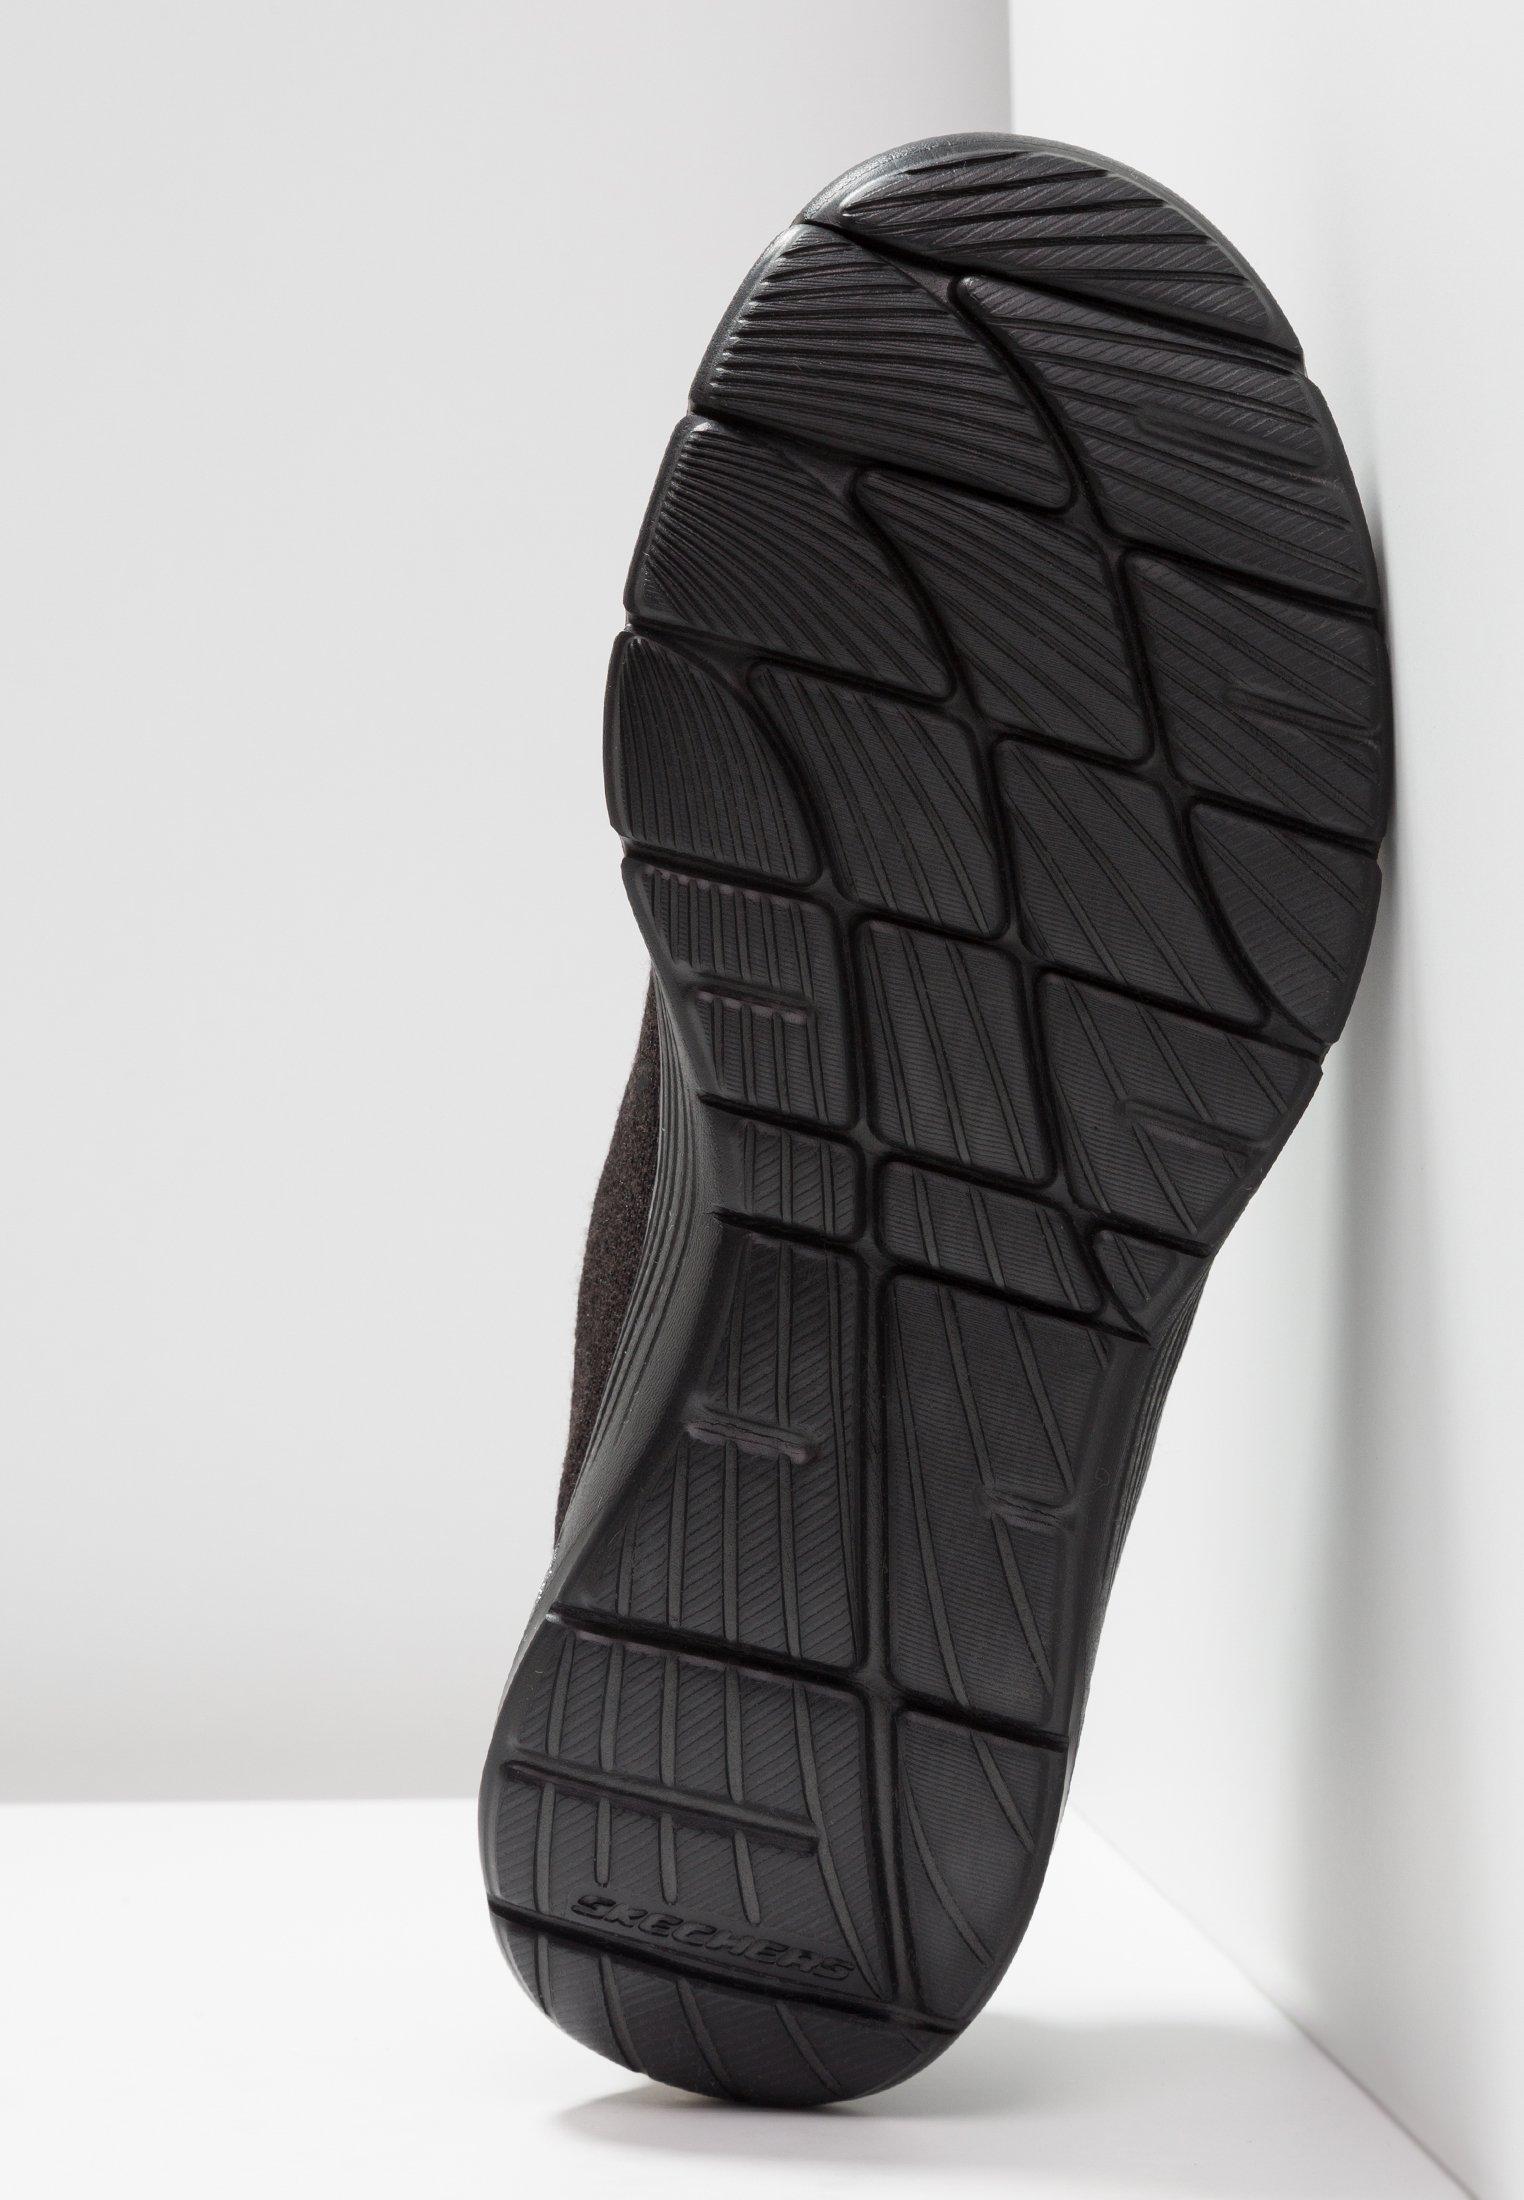 Skechers Empire D'lux - Slippers Black/svart